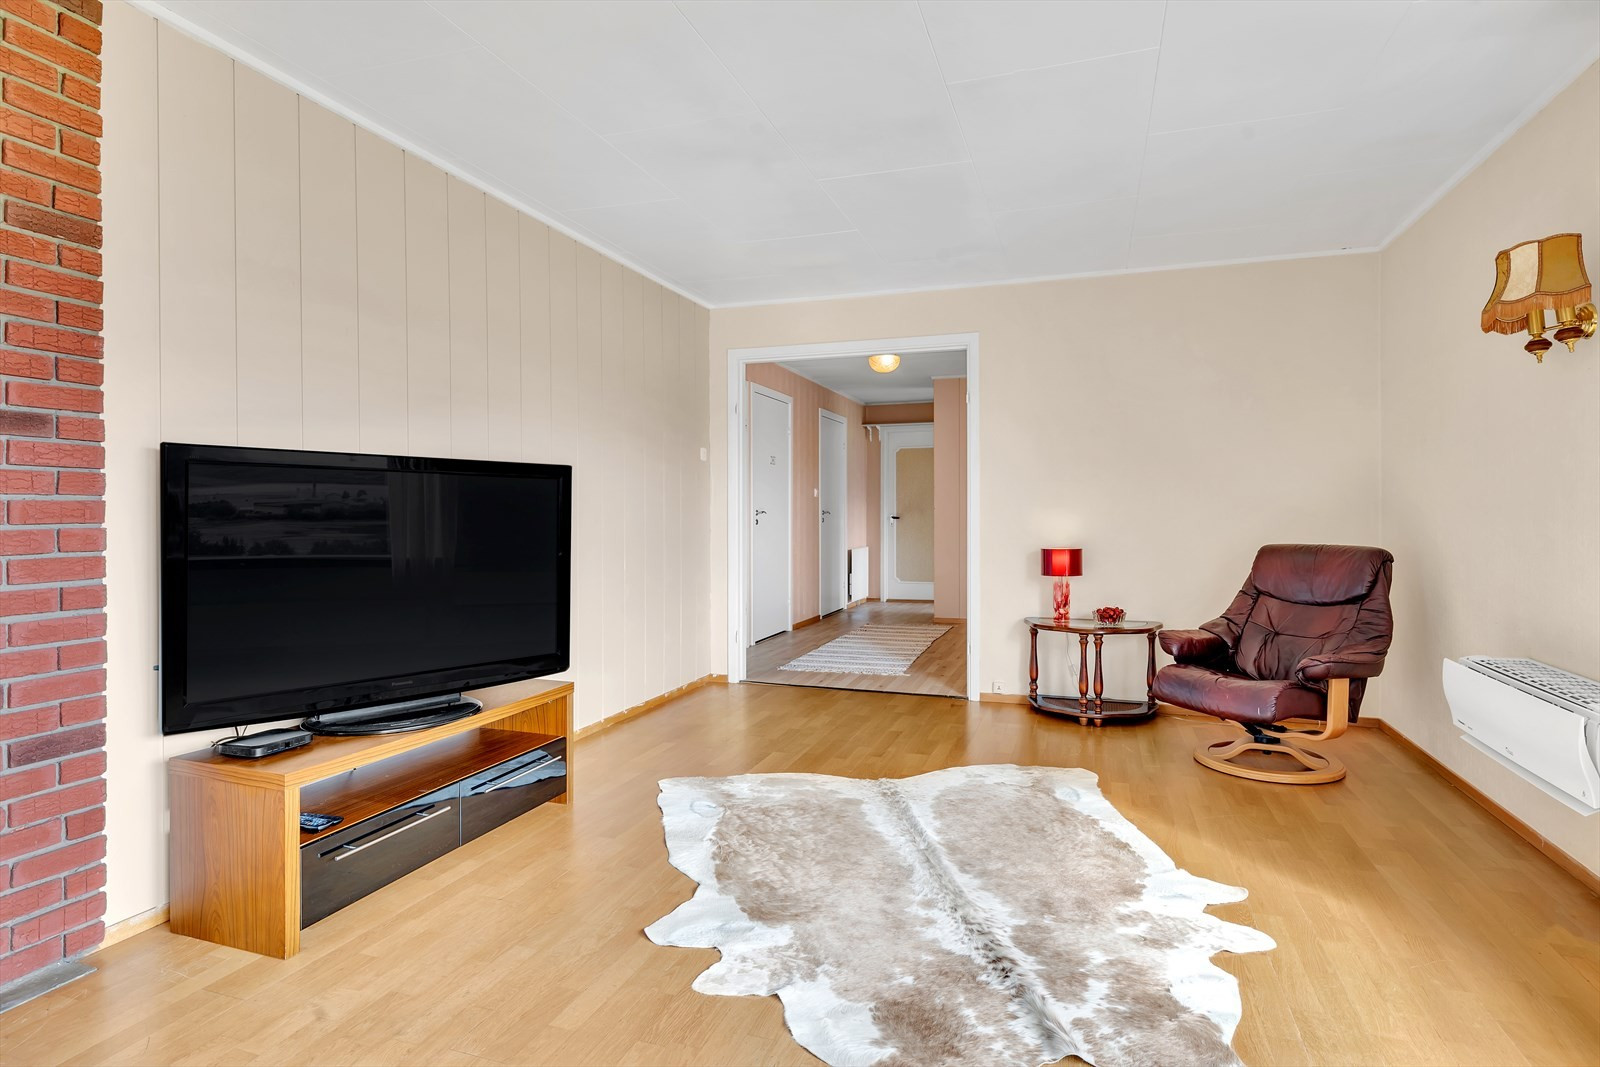 Varmepumpe montert i stuen